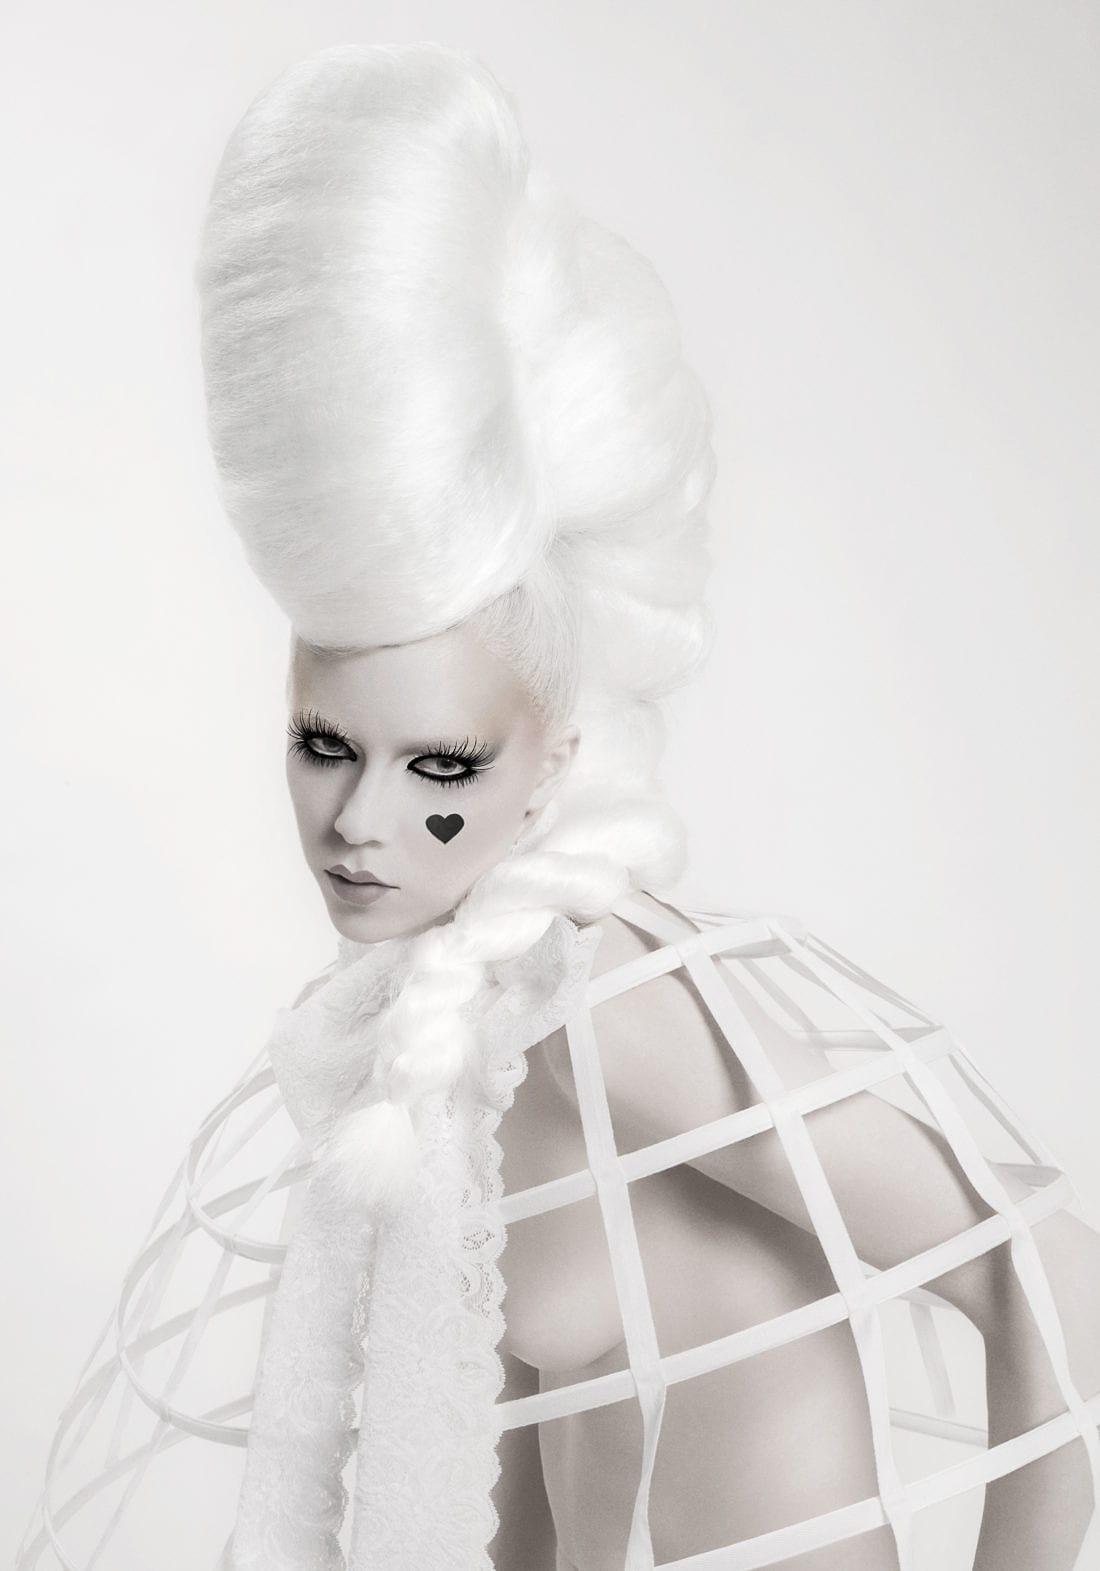 Pierot female coiffure awards © brenda de vries